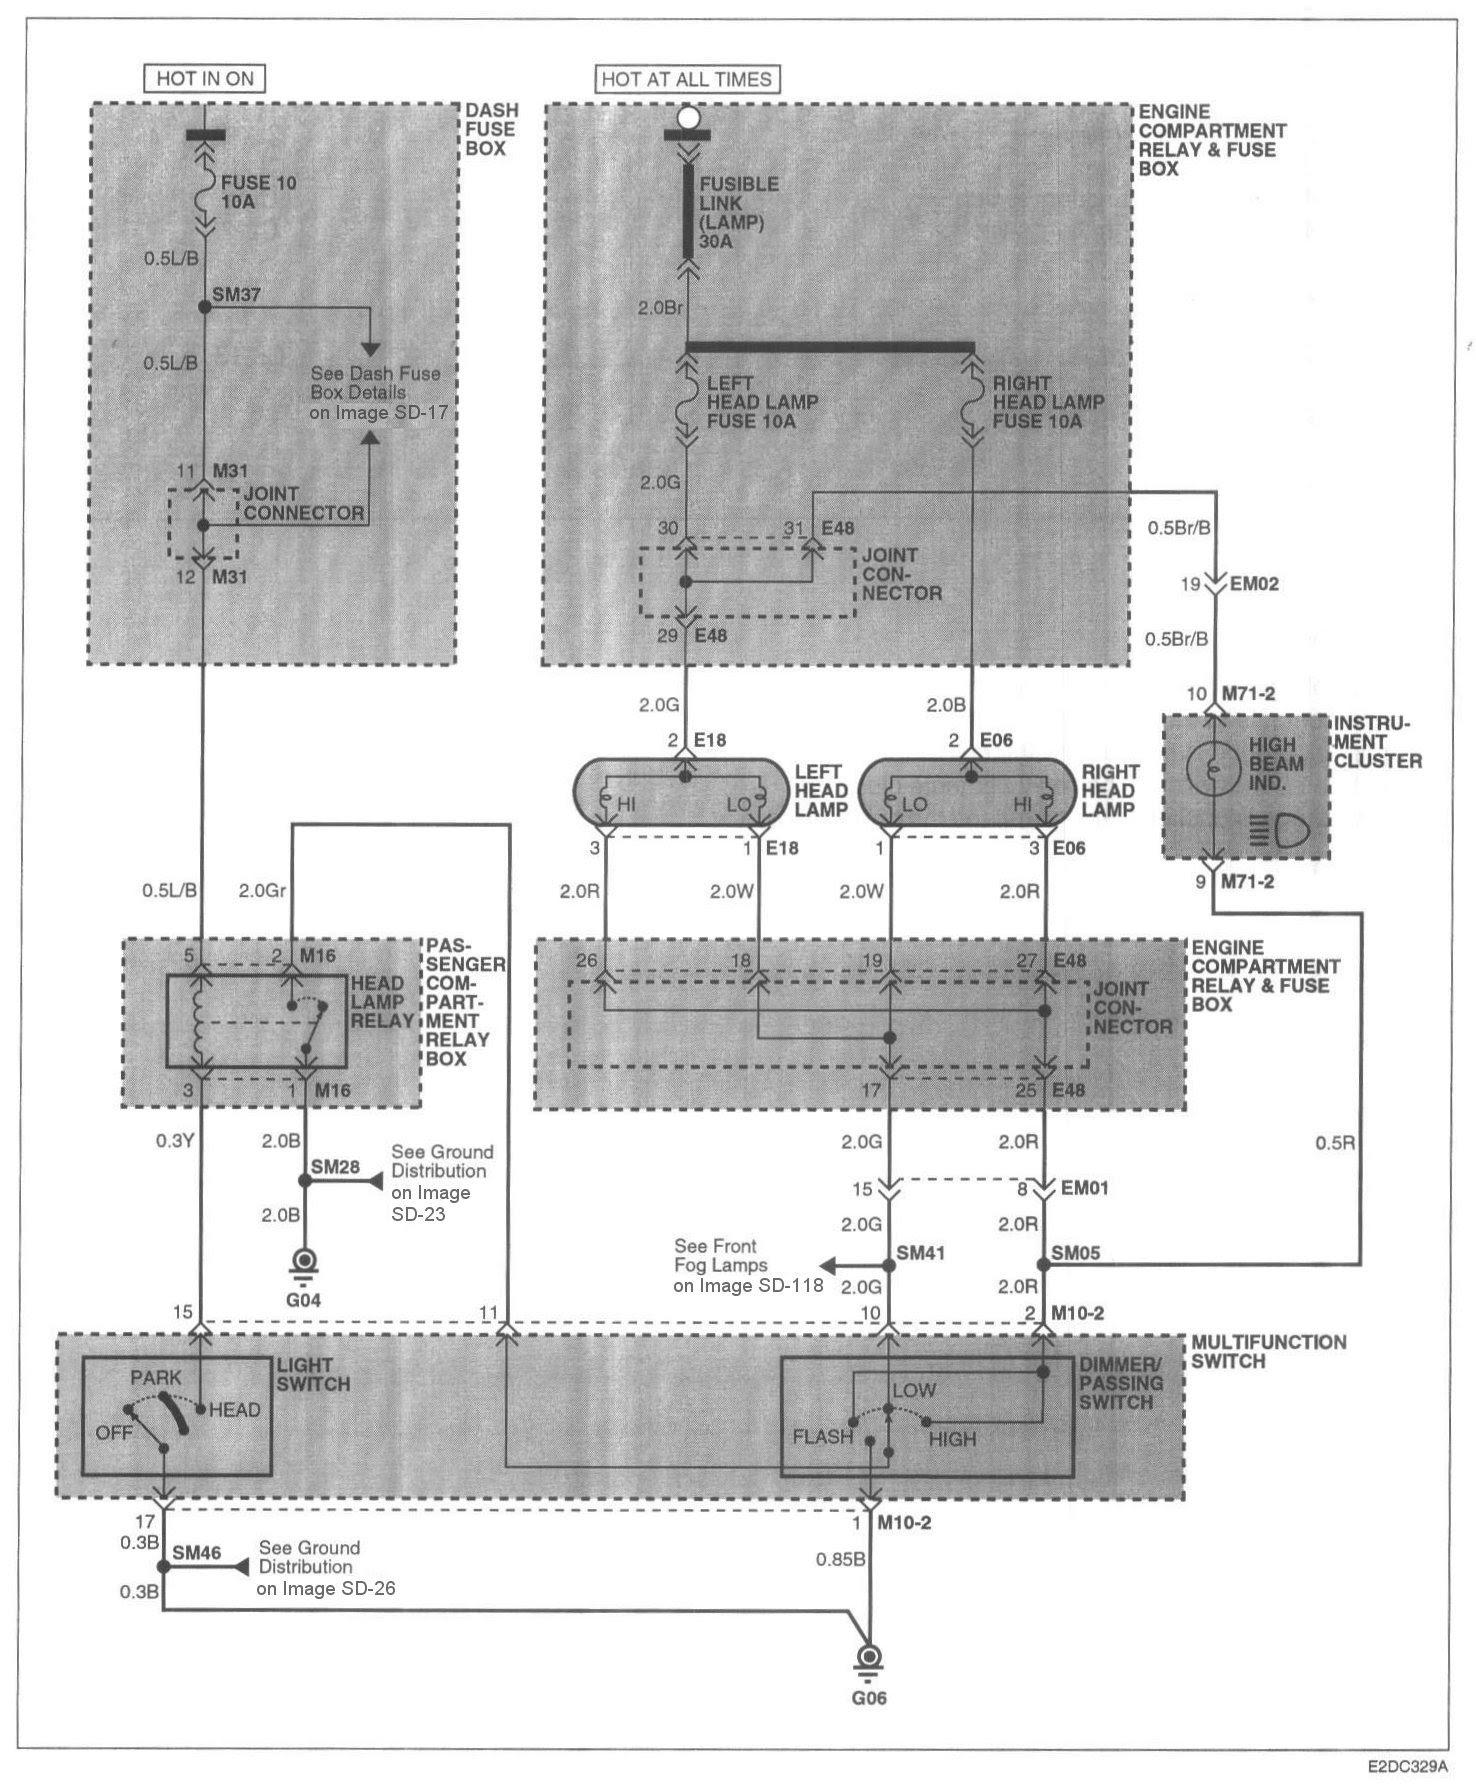 37d7 Wiring Diagram Hyundai Elantra 2002 Wiring Library